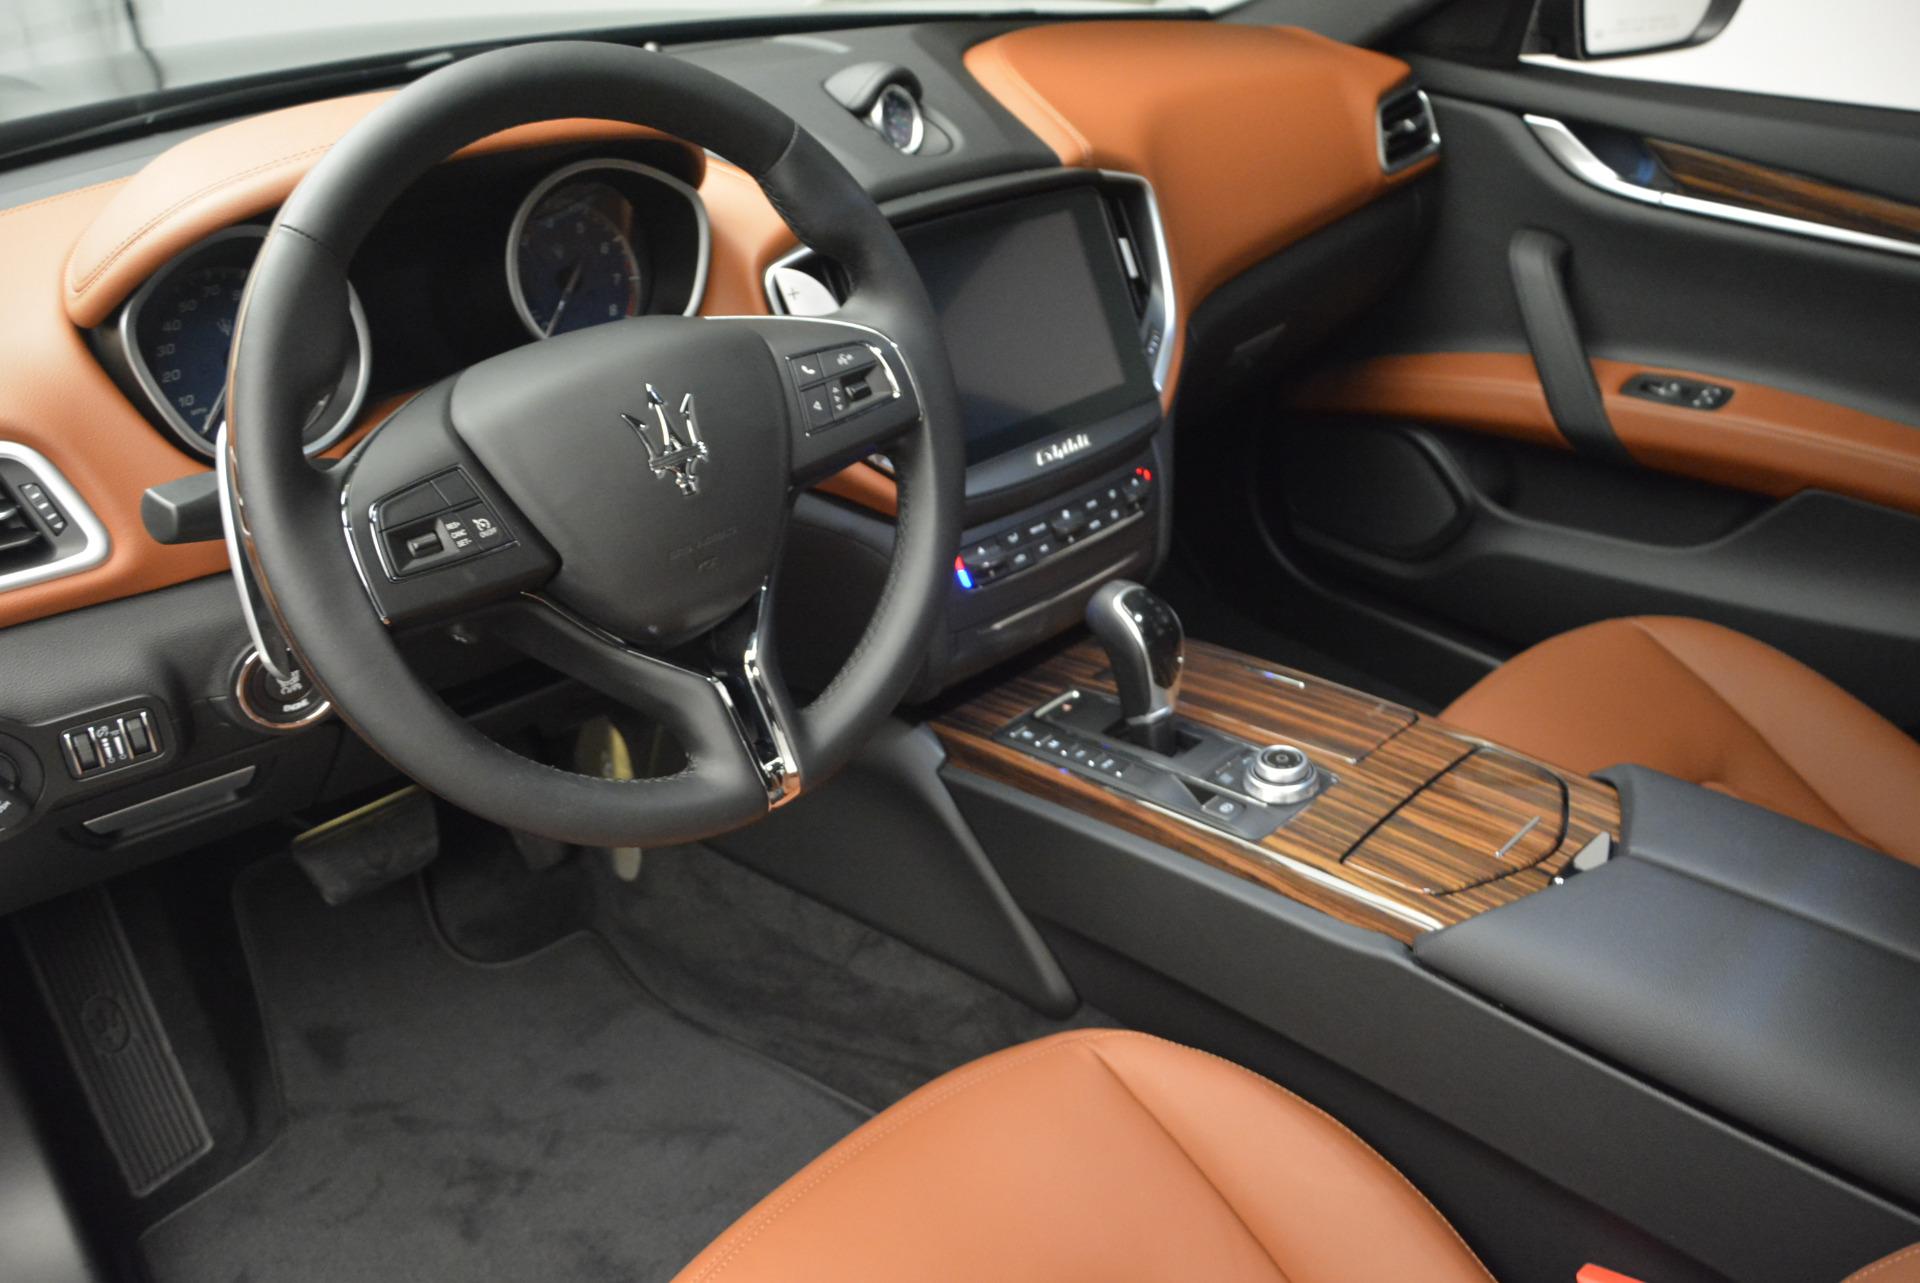 Used 2017 Maserati Ghibli S Q4  EX-LOANER For Sale In Greenwich, CT. Alfa Romeo of Greenwich, W311 565_p13